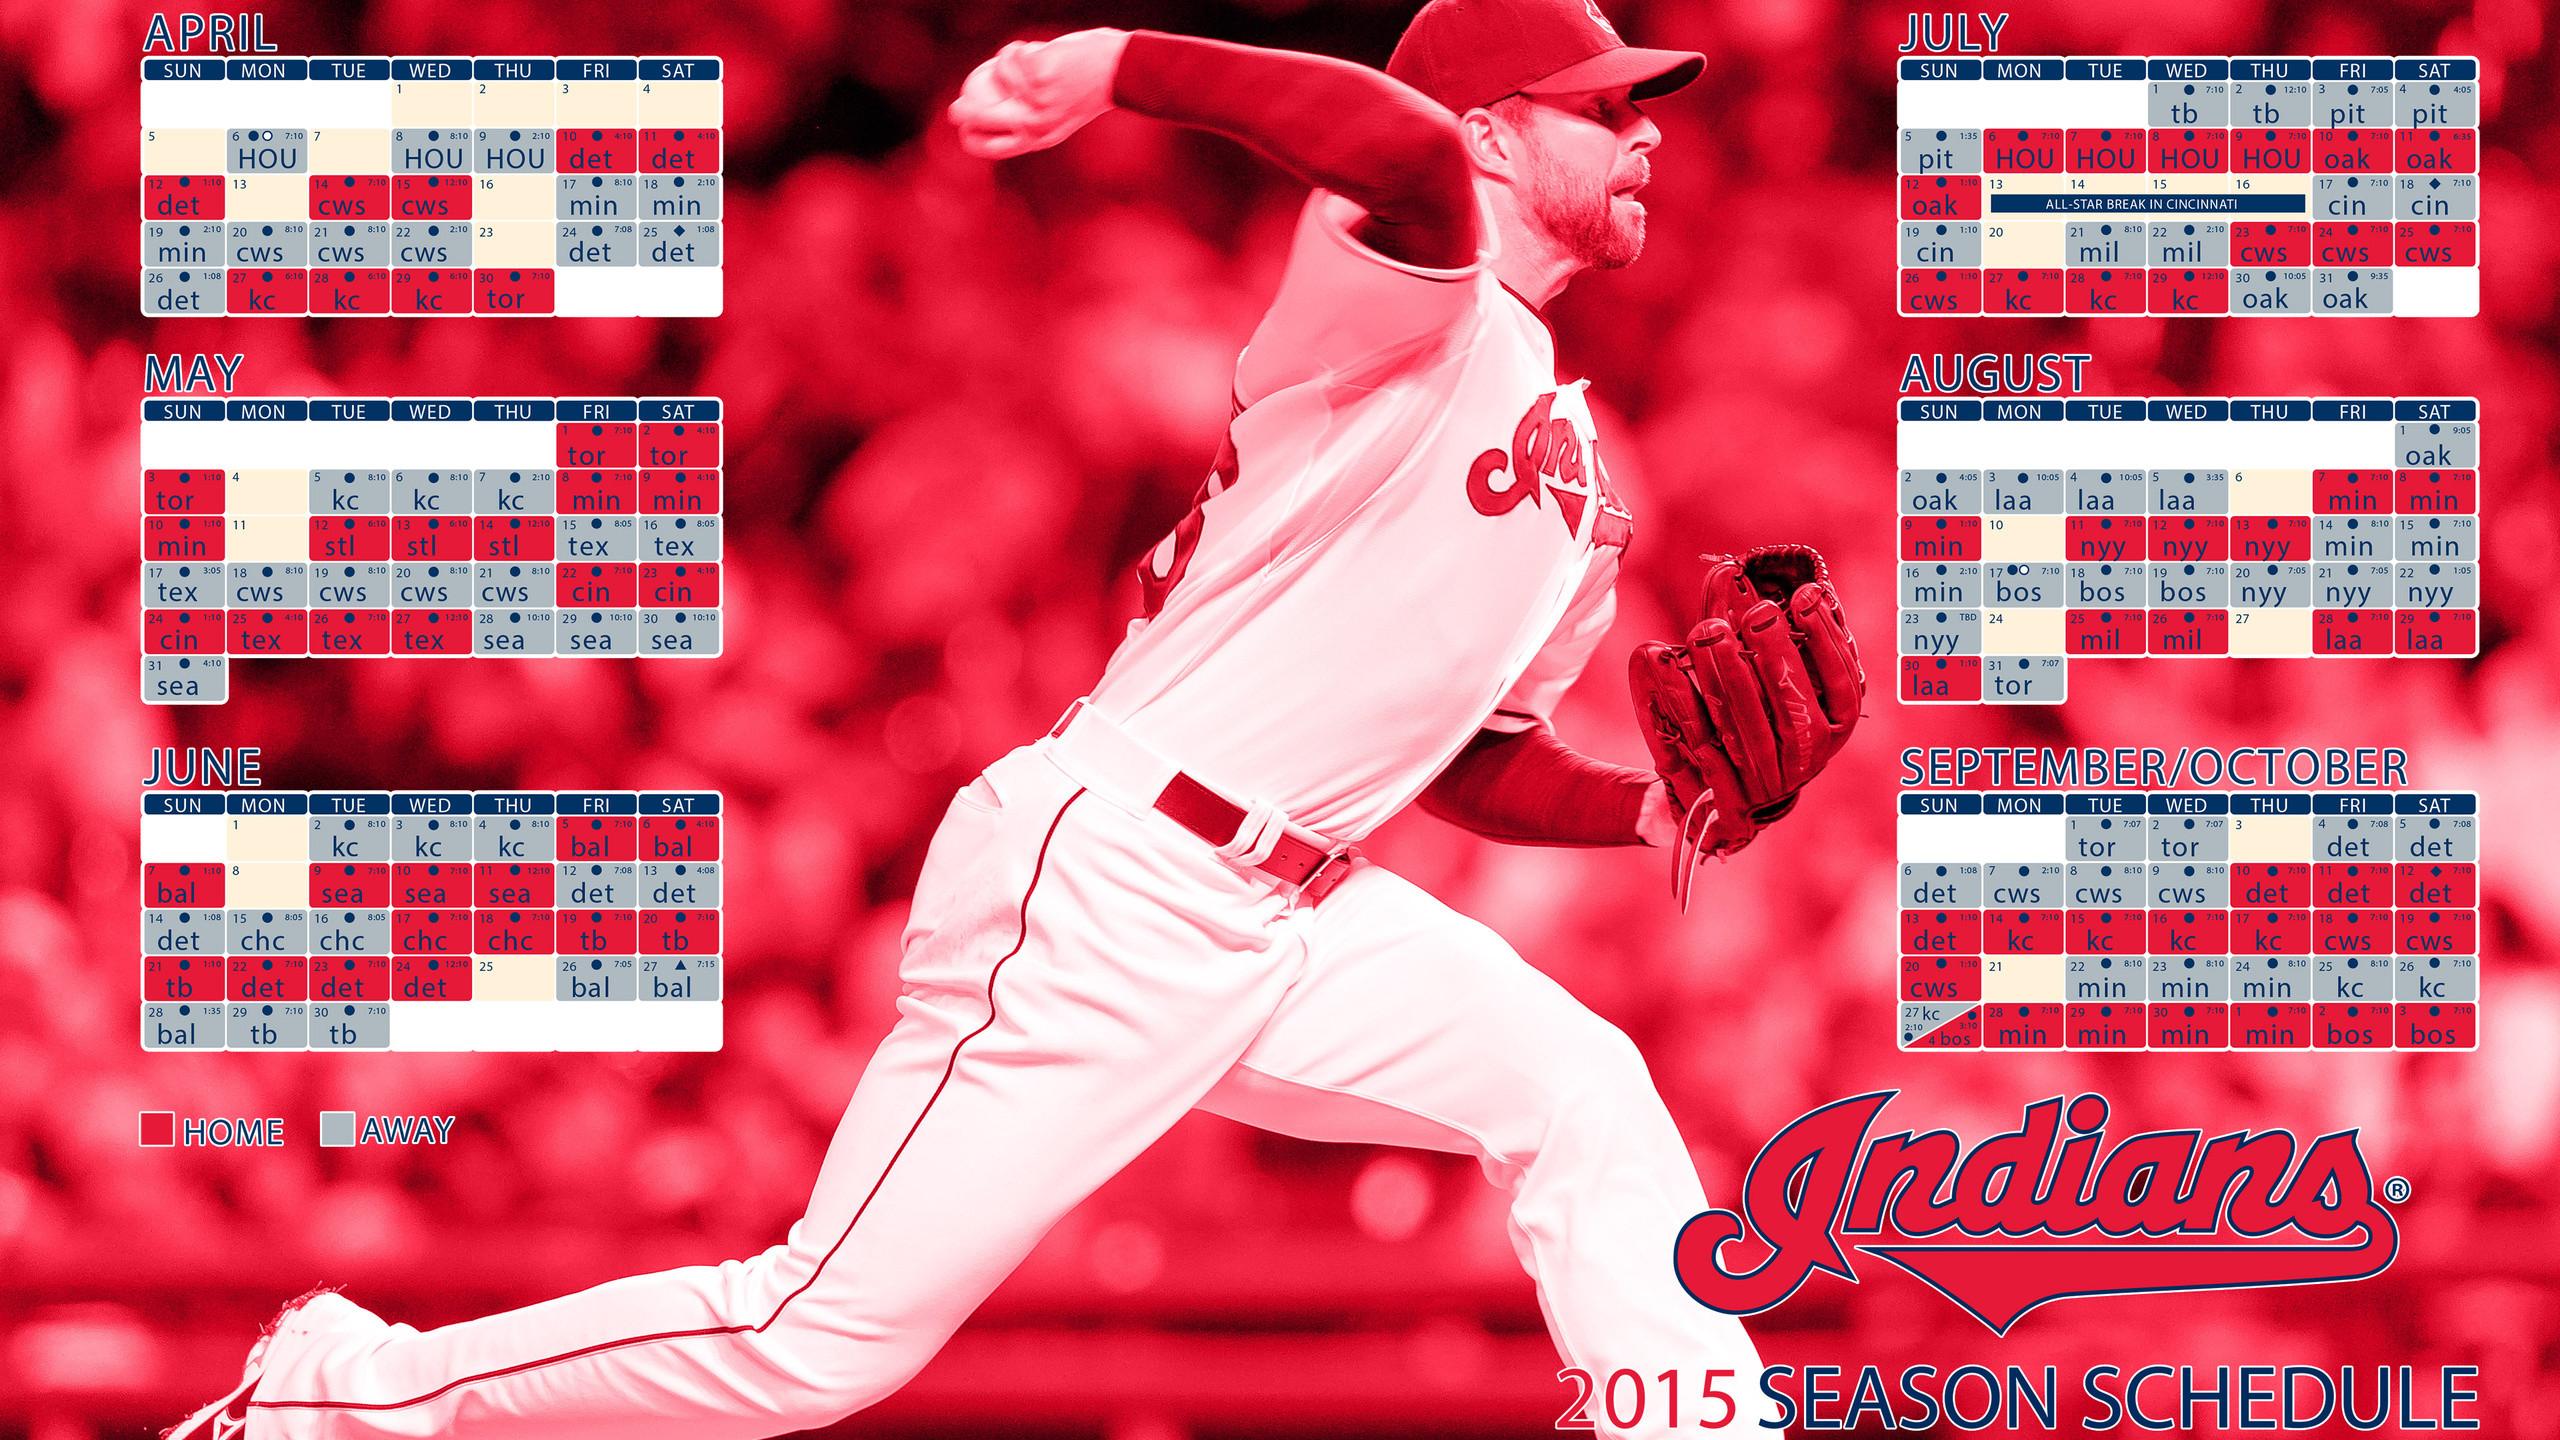 Baseball, 2015, Schedule, Cleveland Indians, Sports, Cleveland Indians Mlb  Schedule 2015